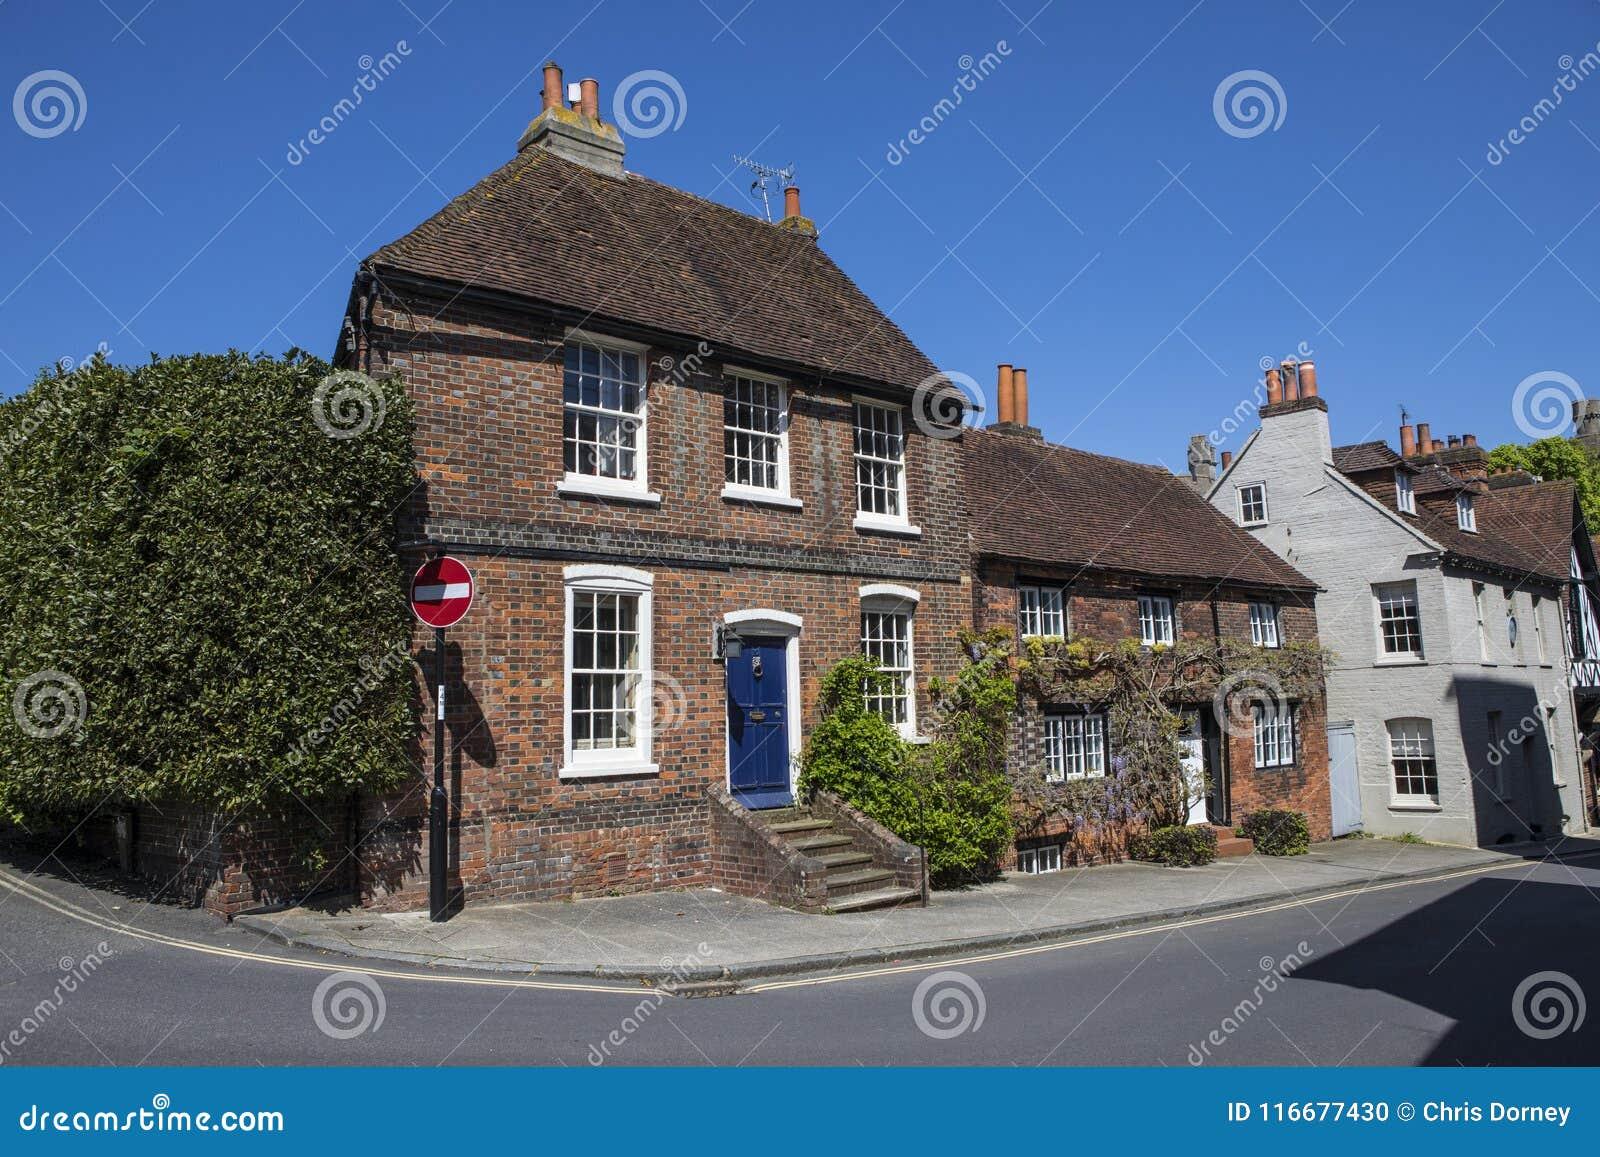 Houses in Arundel, West Sussex